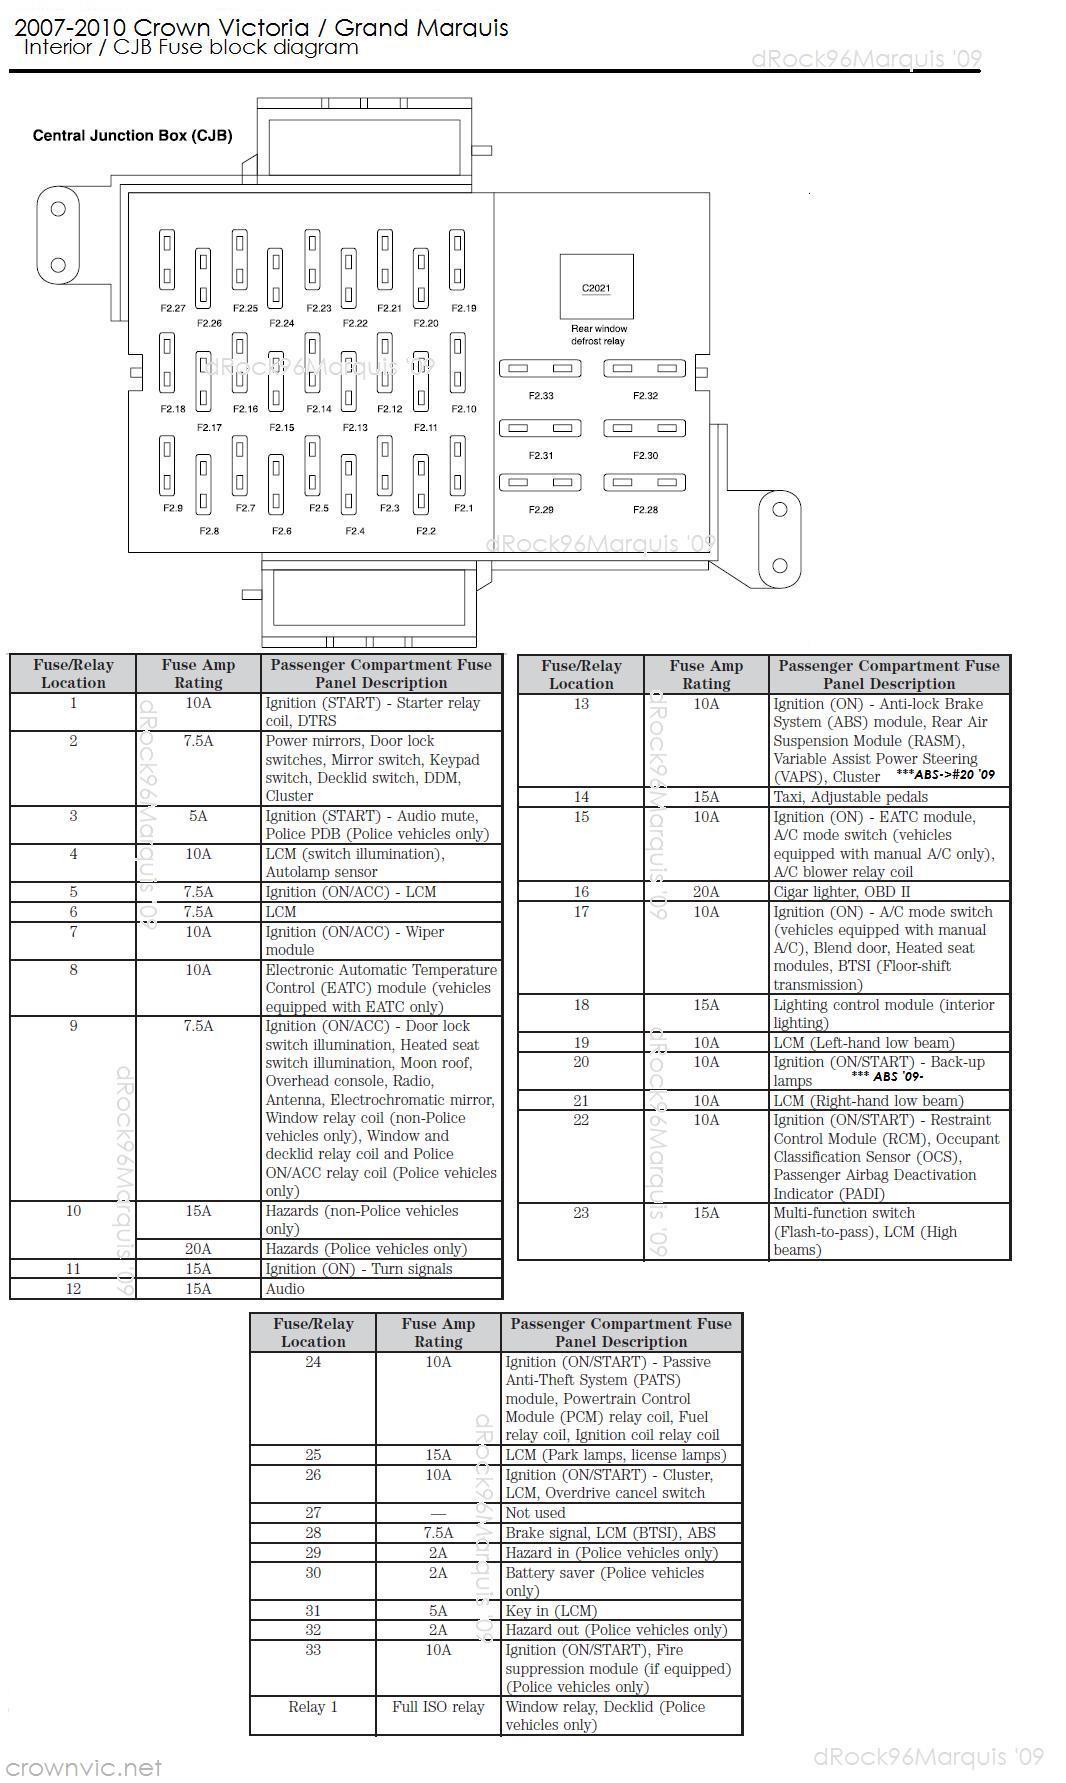 07 Crown Vic Fuse Diagram - Schema Wiring Diagram - Crown Vic Radio Wiring Diagram